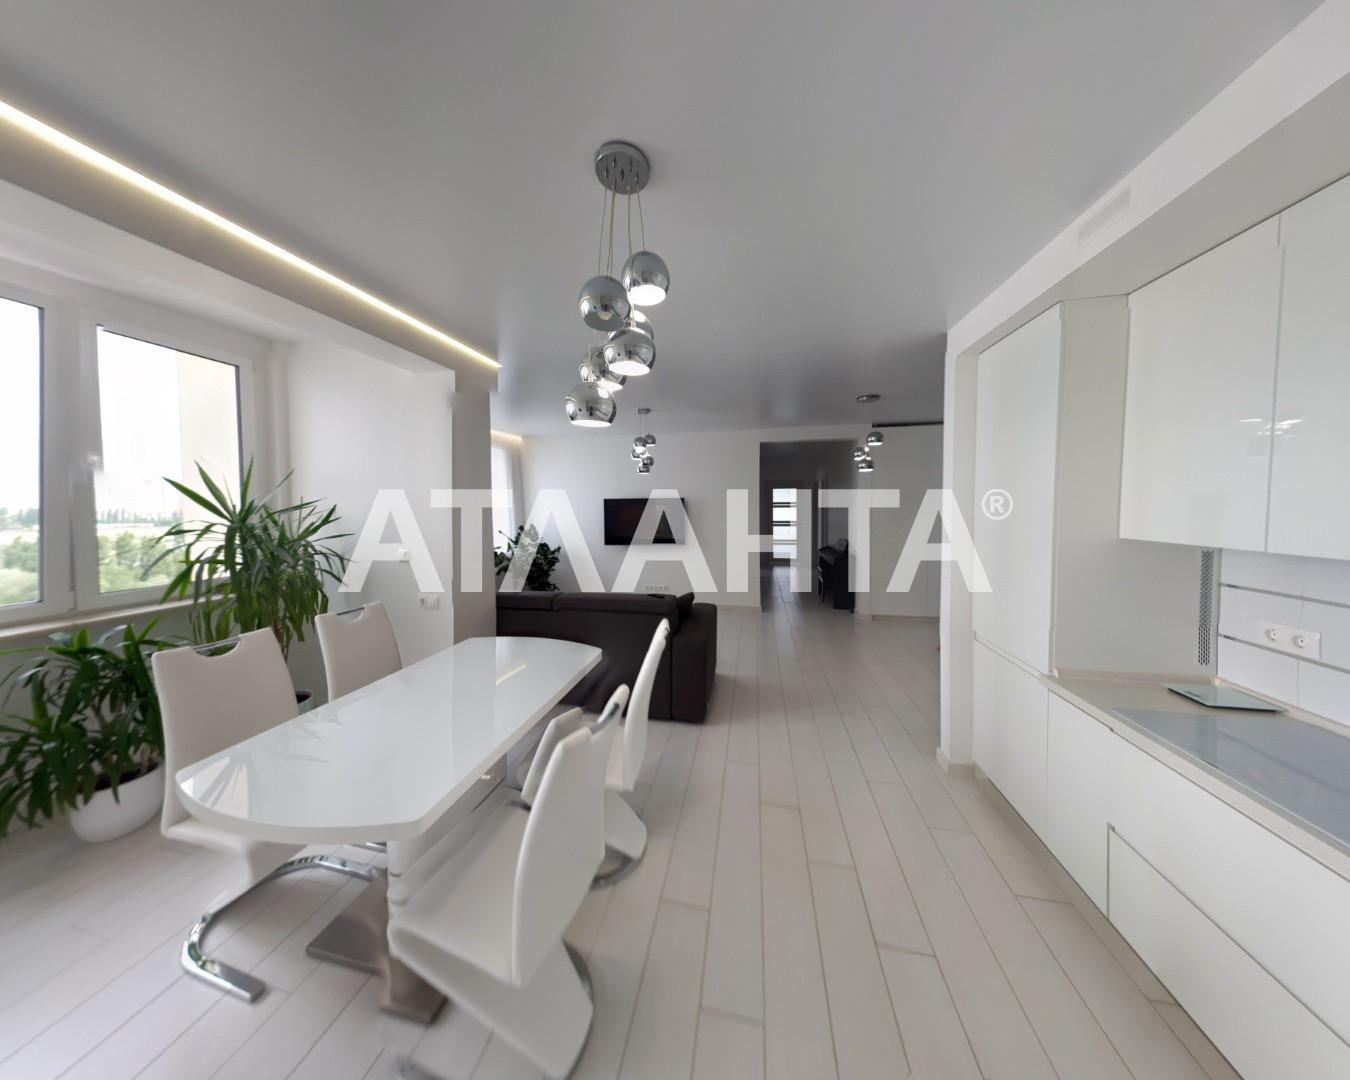 Продается 3-комнатная Квартира на ул. Просп. Глушкова — 160 000 у.е. (фото №25)